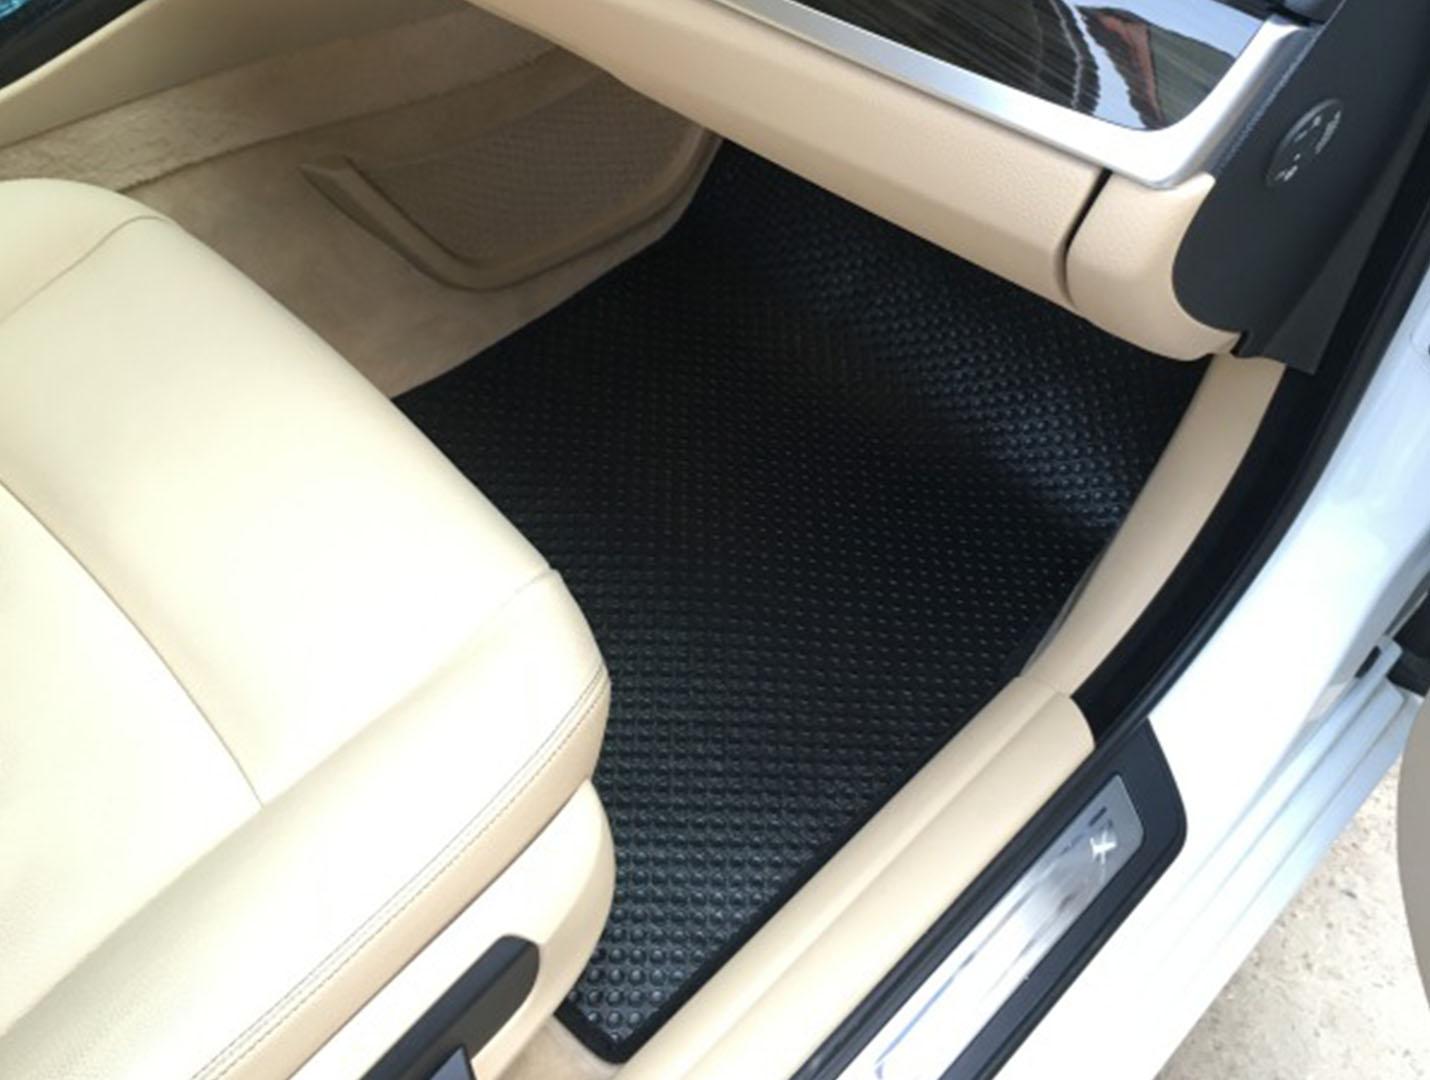 Thảm lót sàn BMW 530i F10